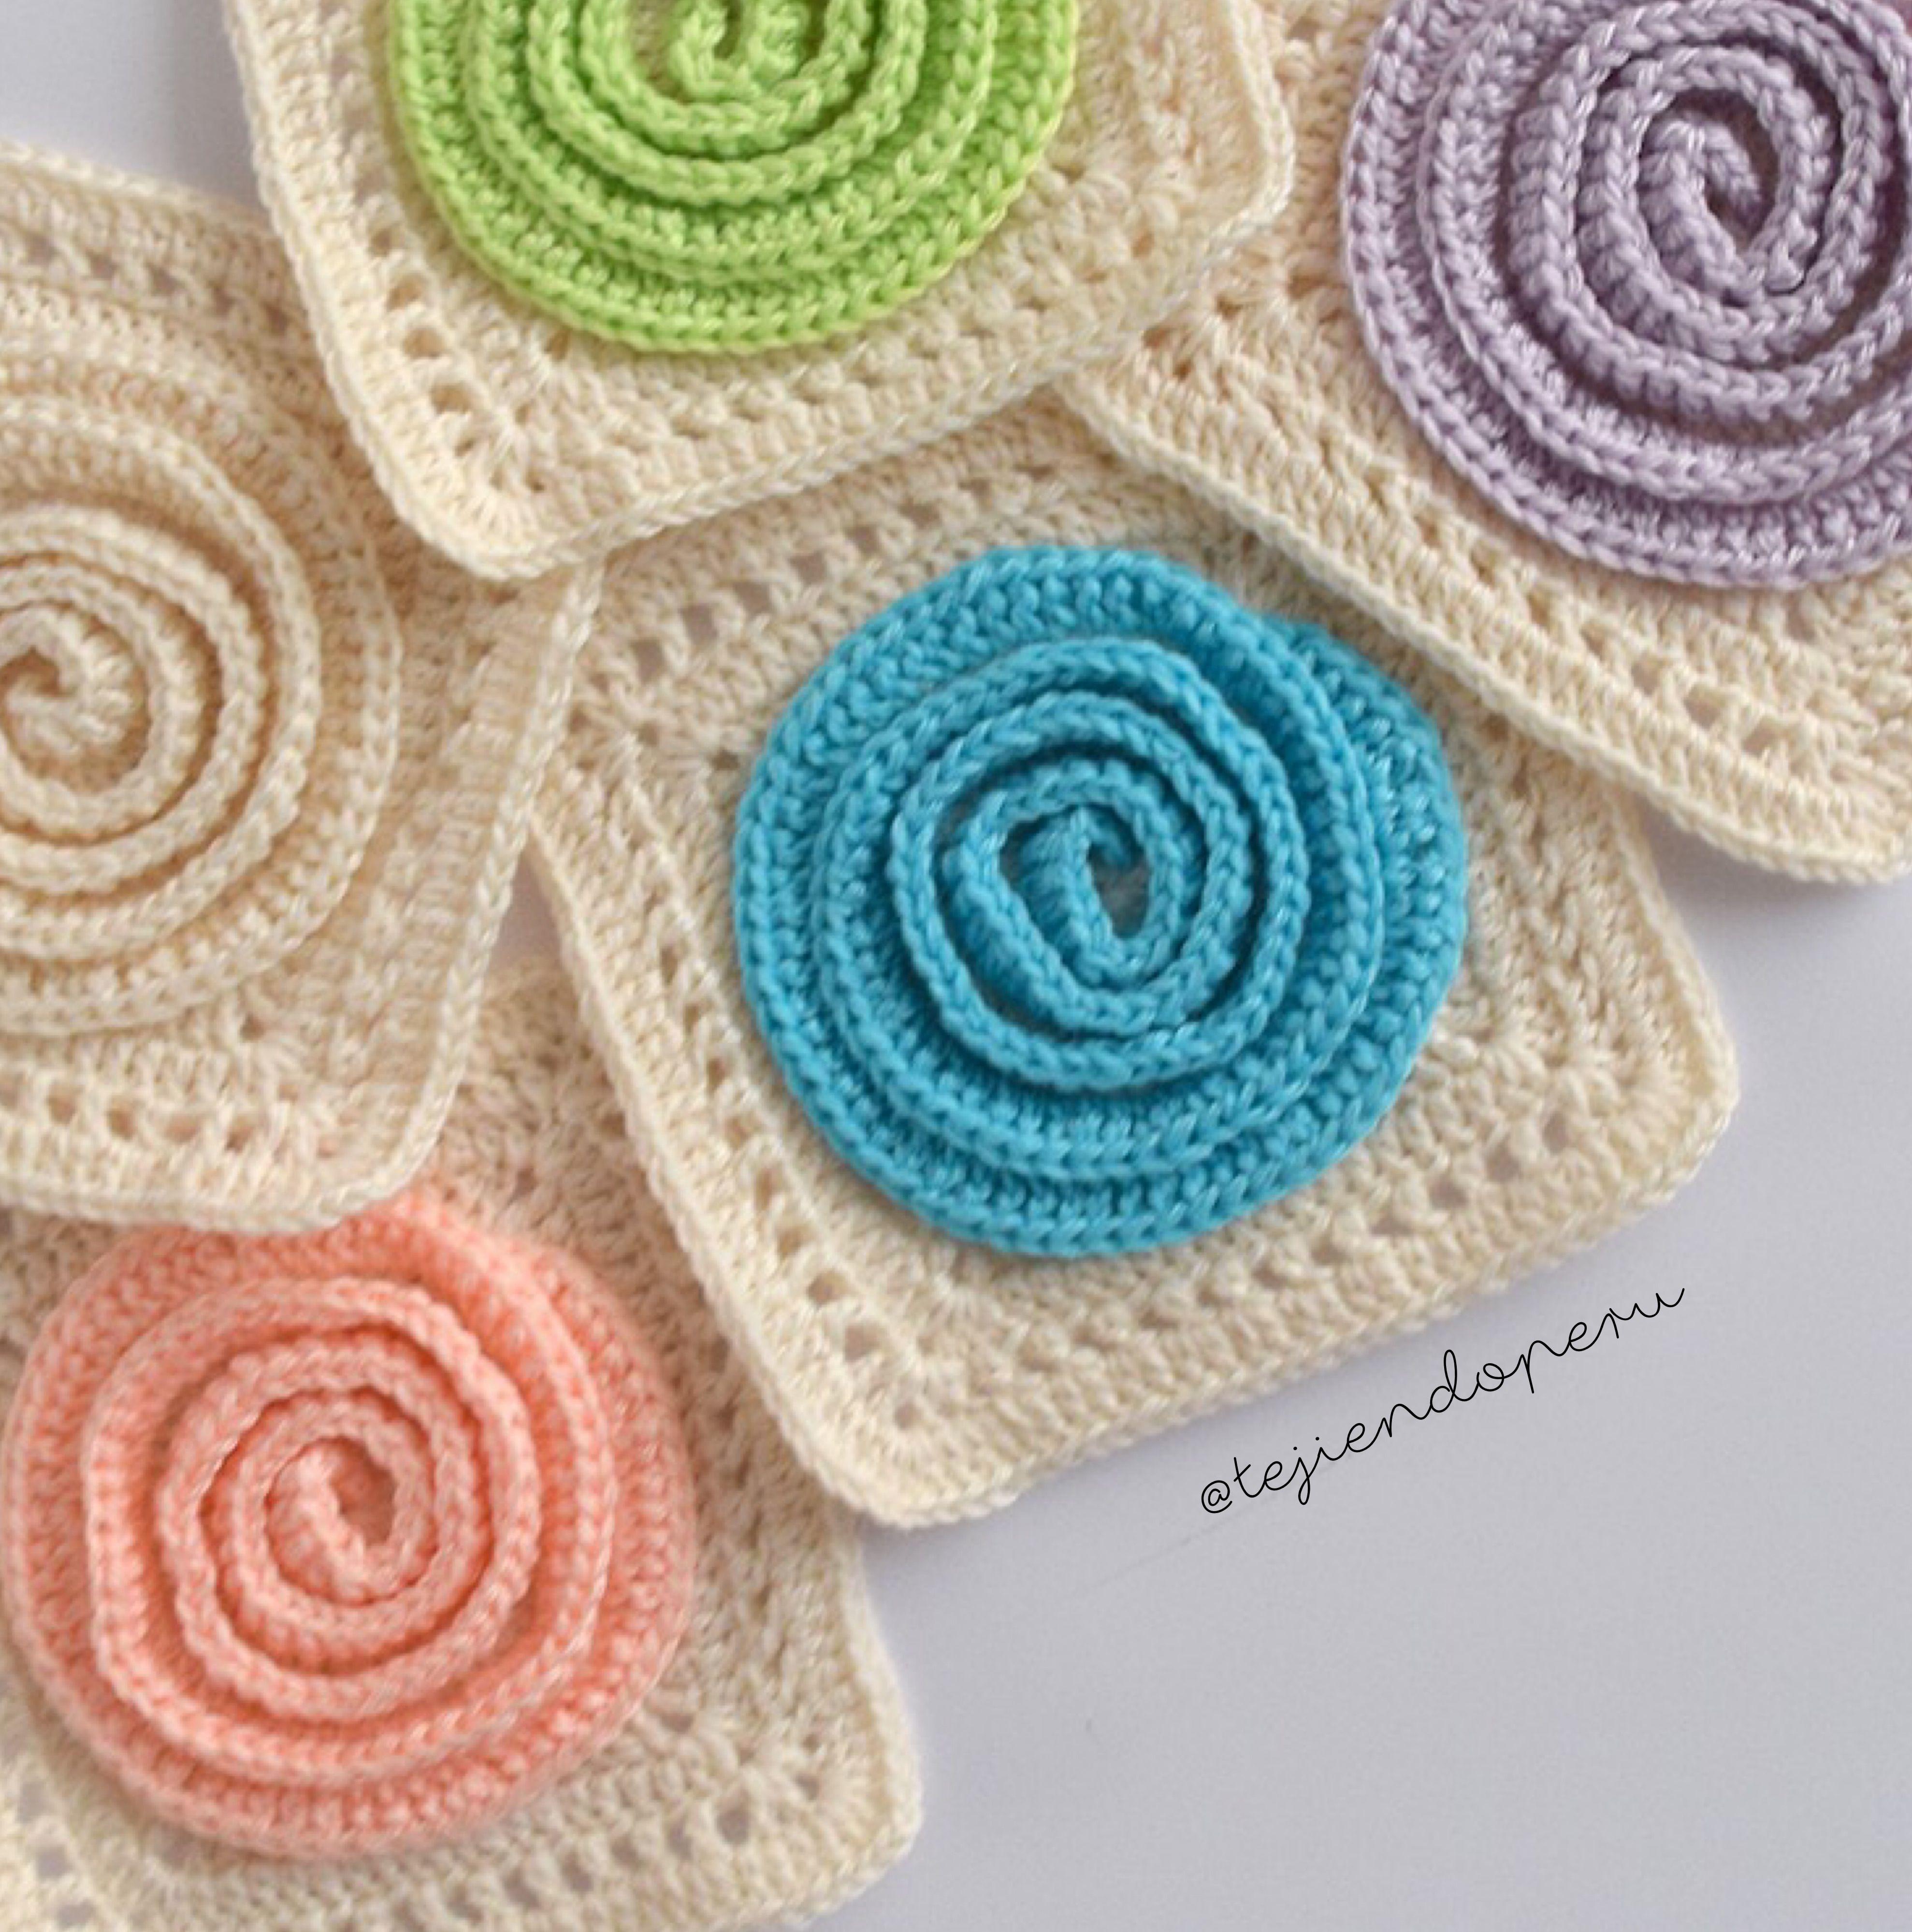 Granny o cuadrado Rosetta tejido a crochet paso a paso en vídeo ...